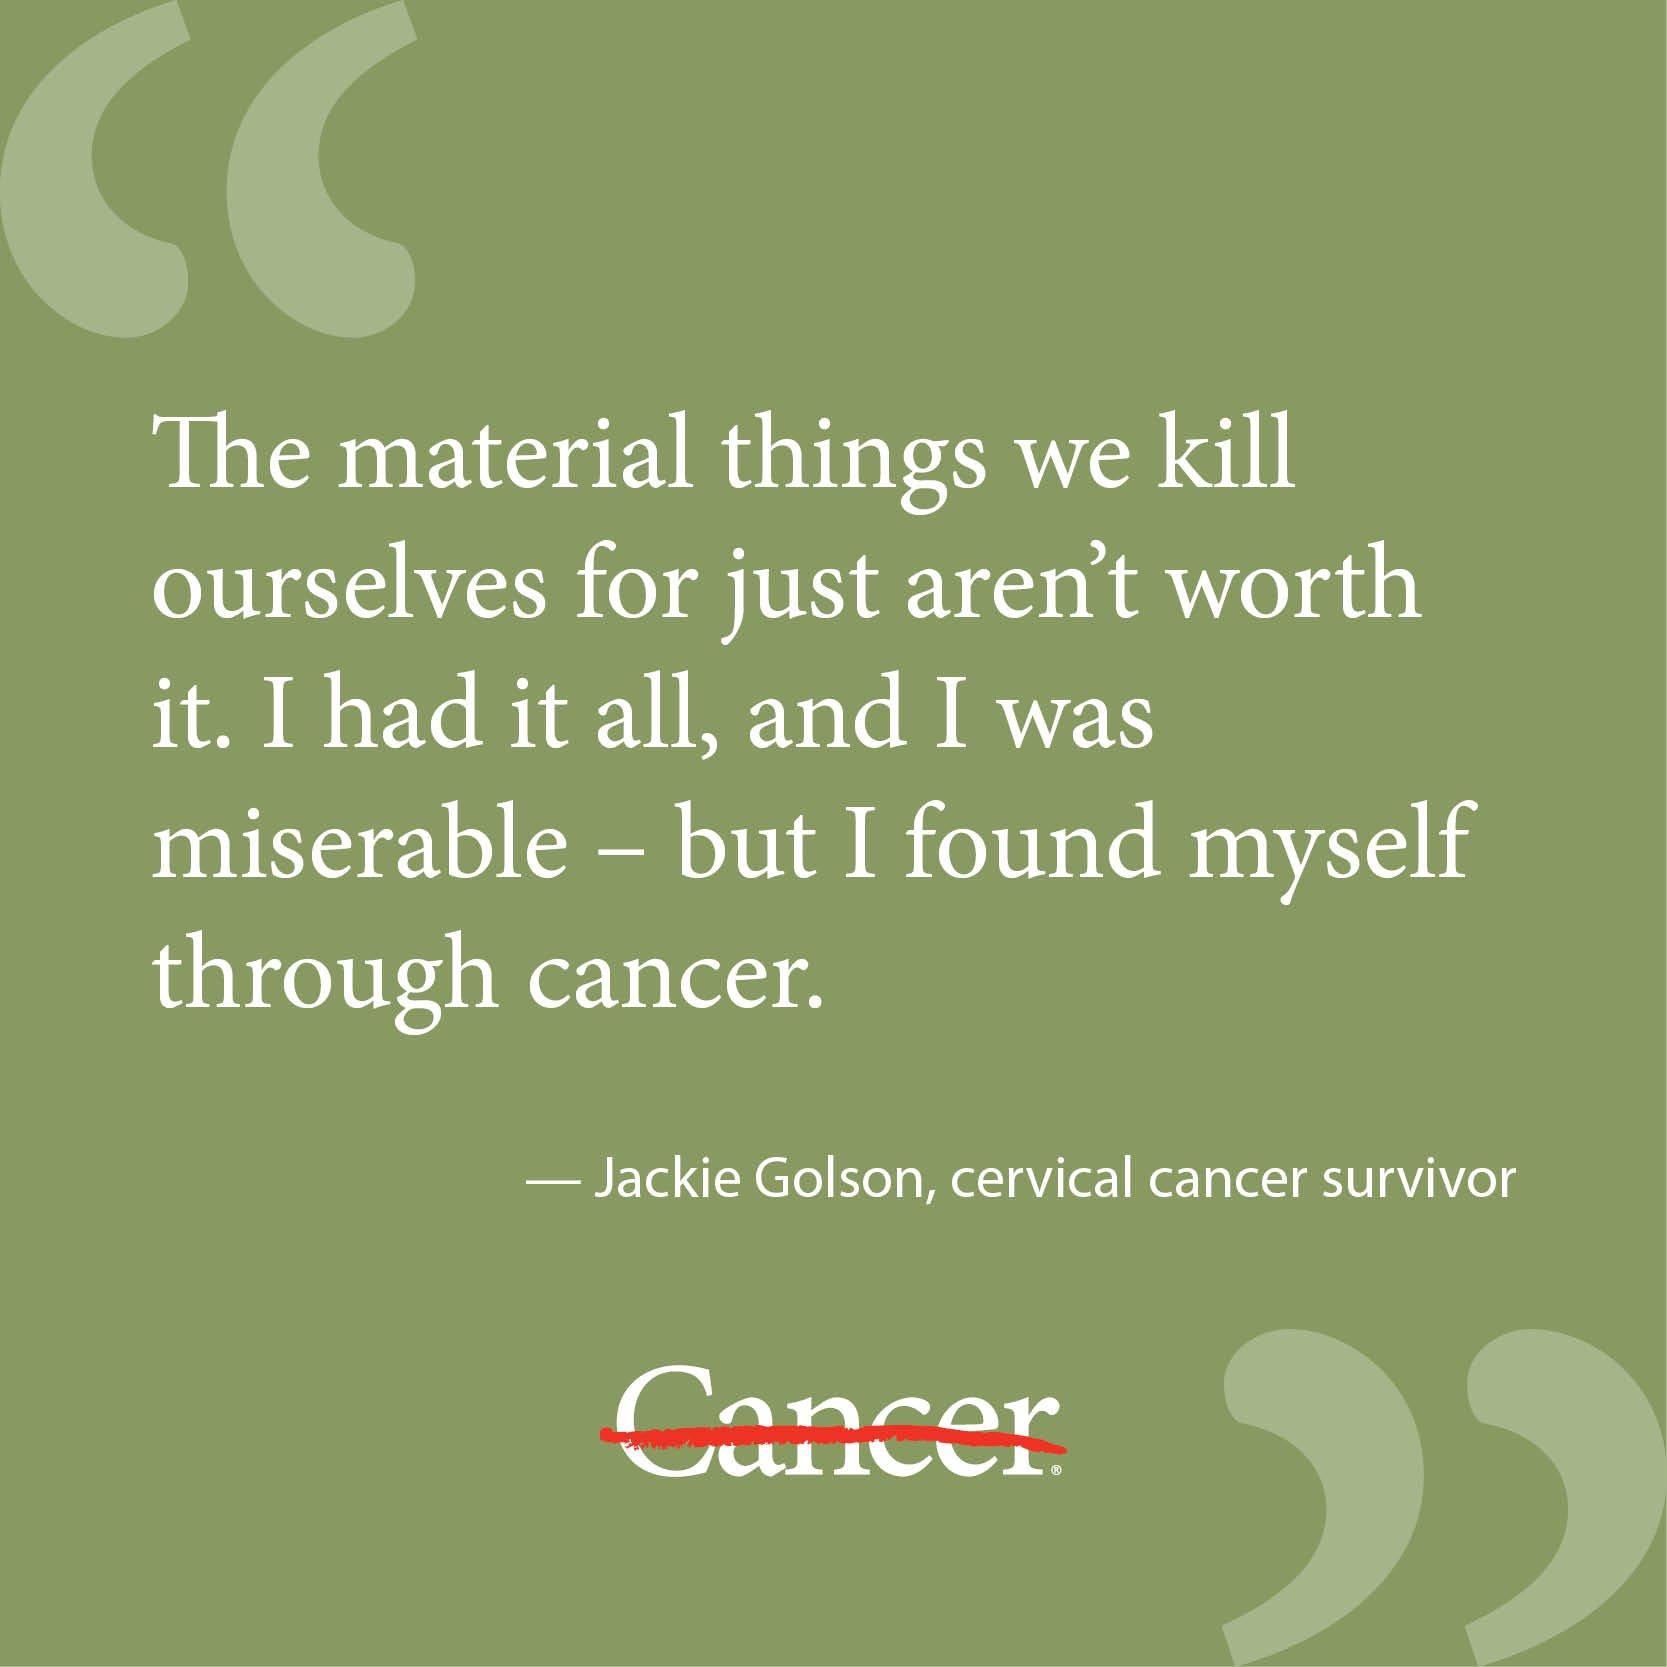 10 Year Cancer Survivor Quotes: A Cancer Survivors Heart Quotes. QuotesGram